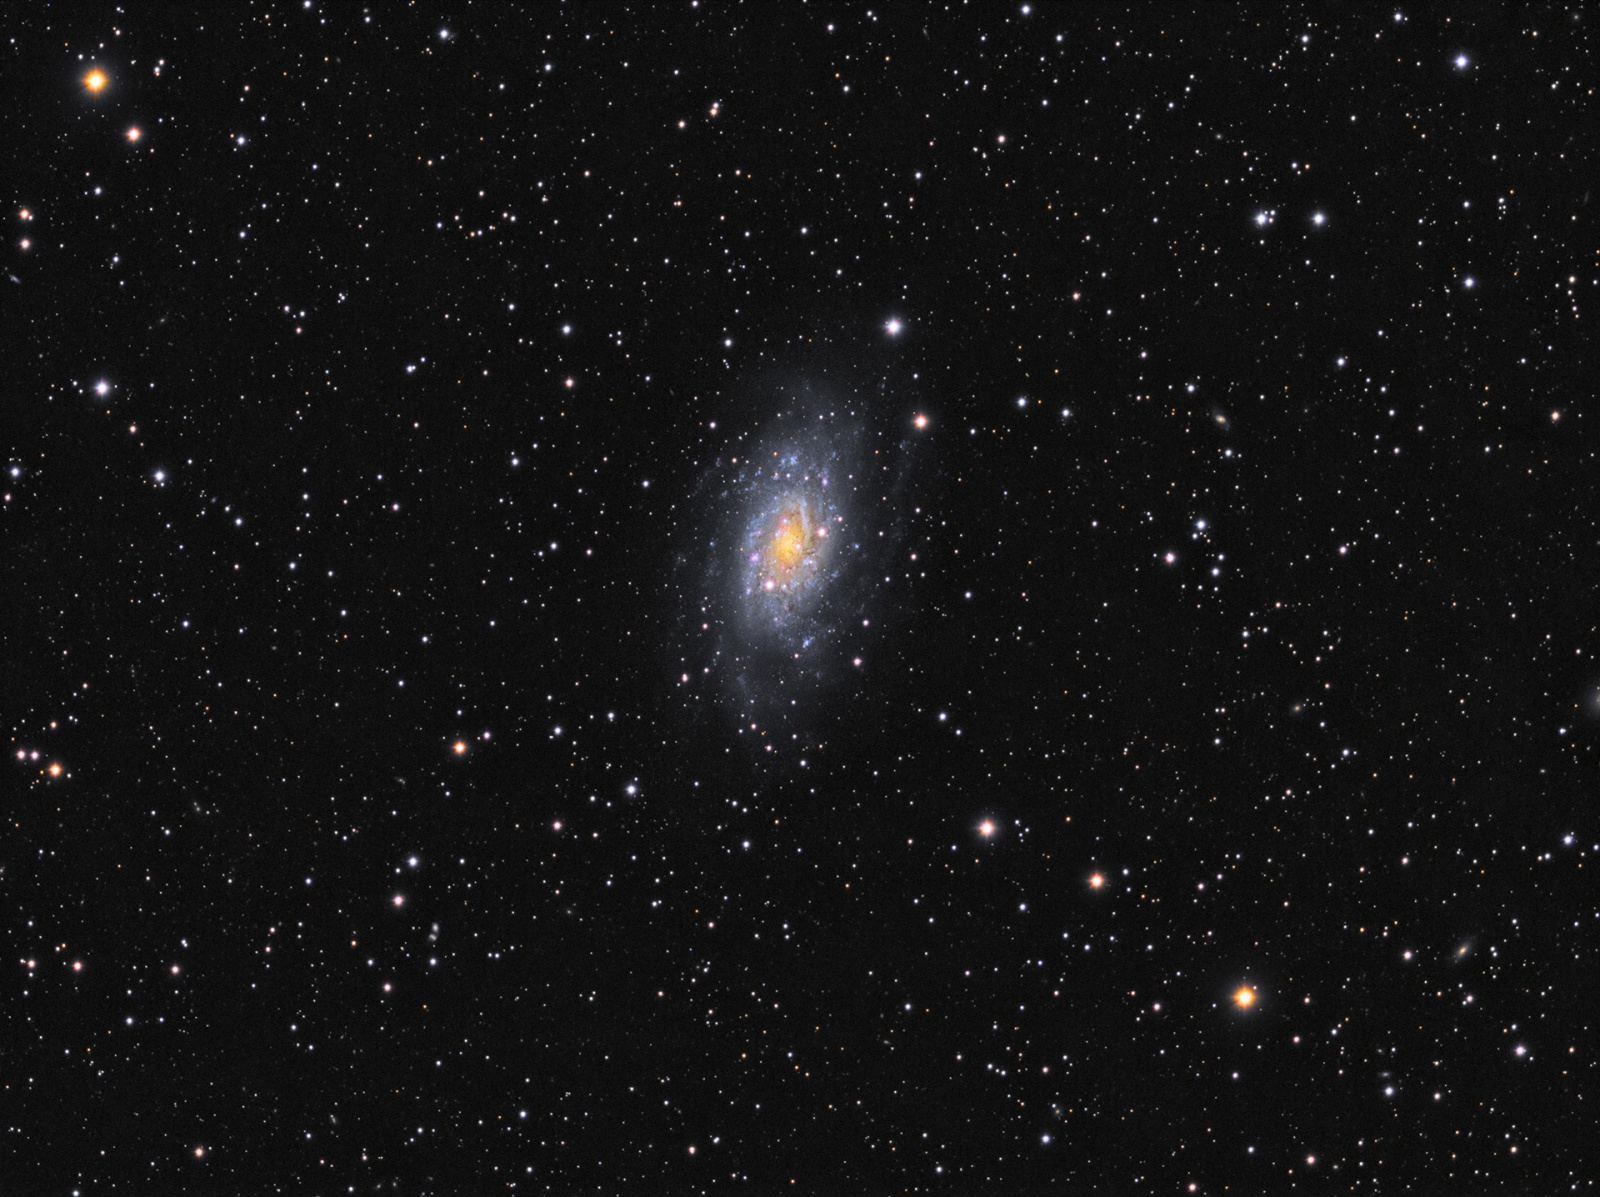 !Final_NGC2403_LRGB_FIXbckgr_v1_noMagenta_1920px.jpg